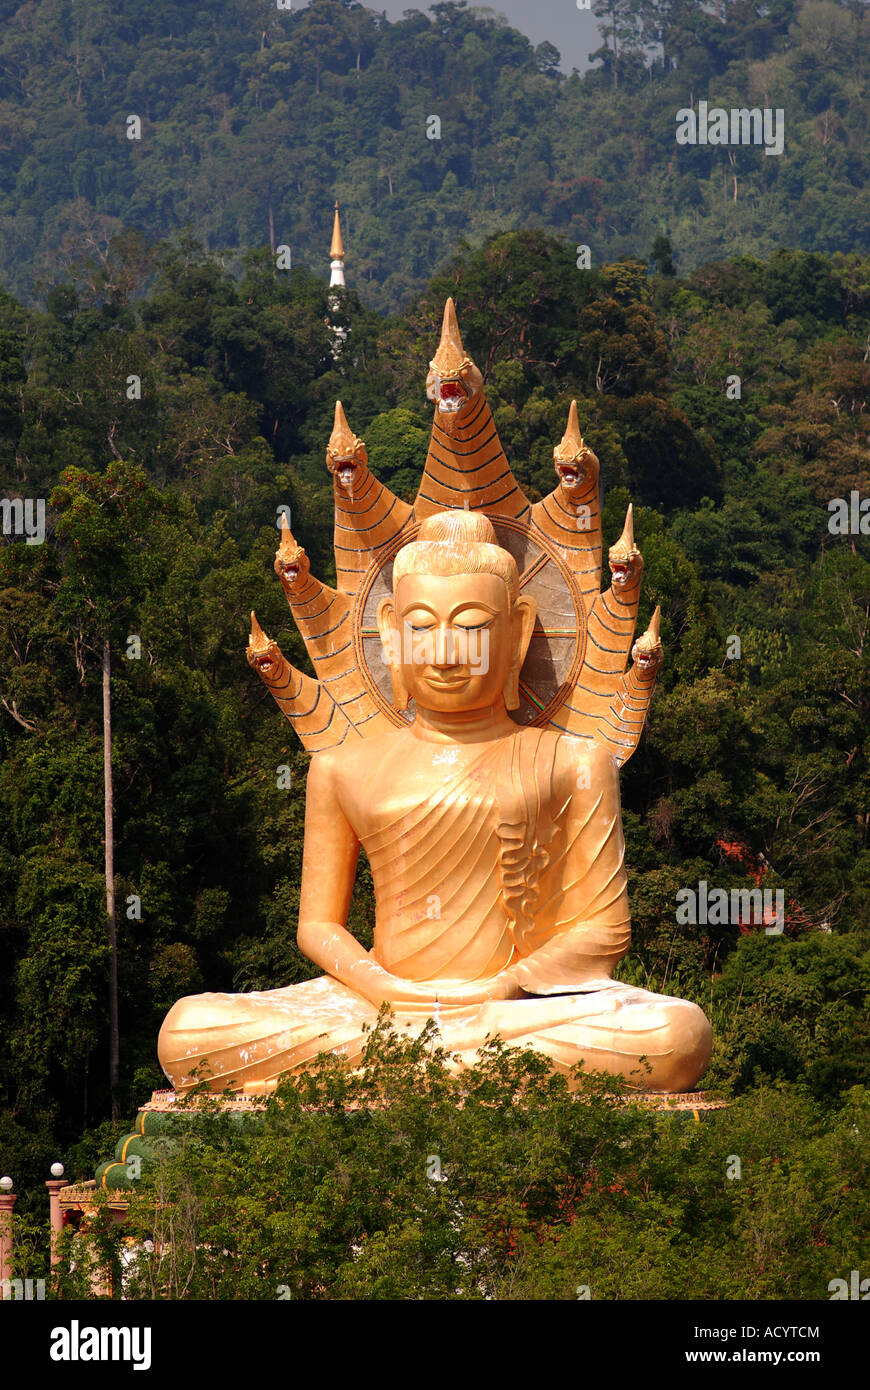 Giant Buddha Bang Riang Buddhism Thailand Travel